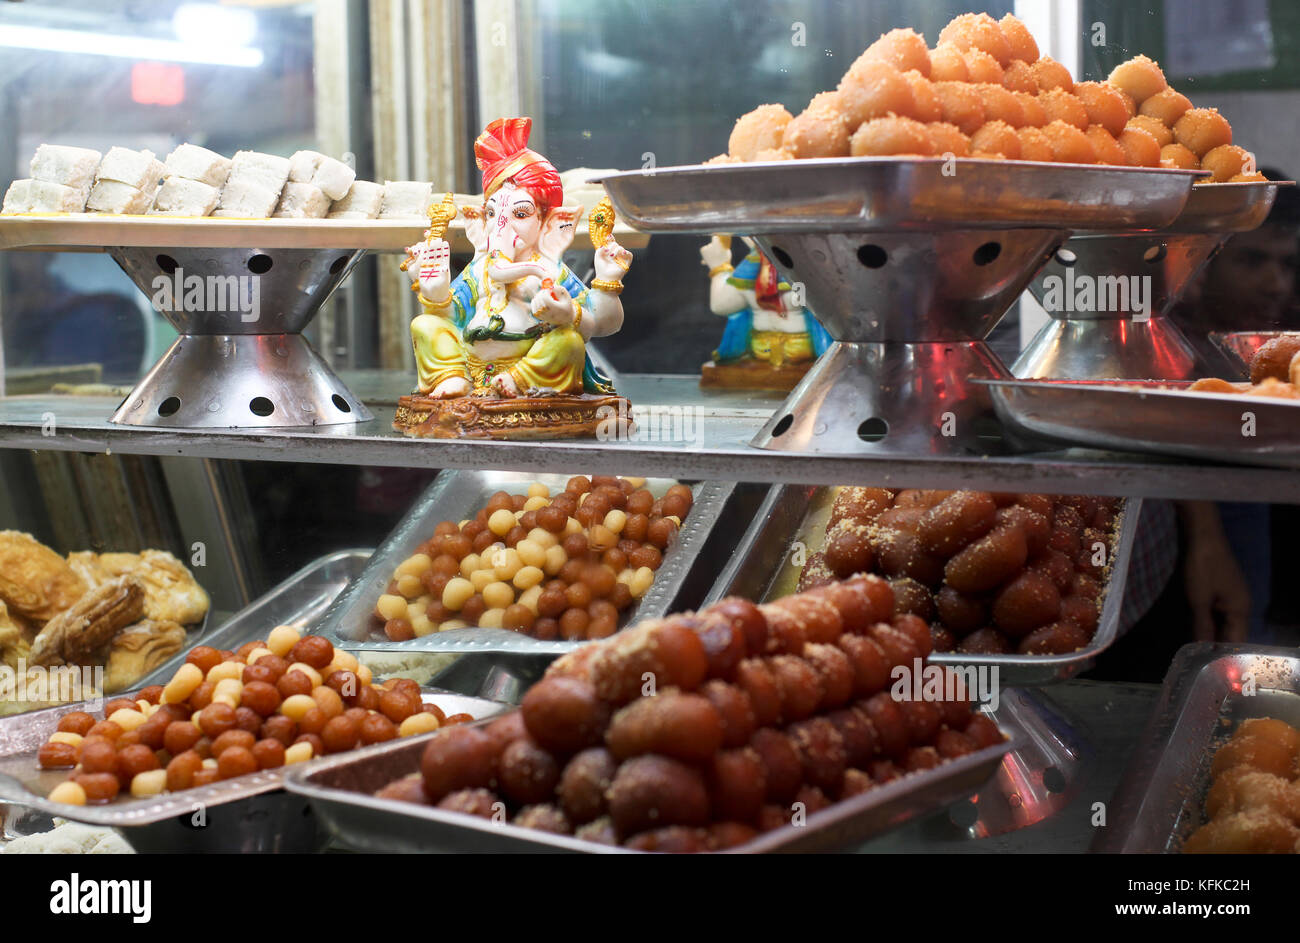 Window of homemade sweet shop in Kurigram, Bangladesh - Stock Image